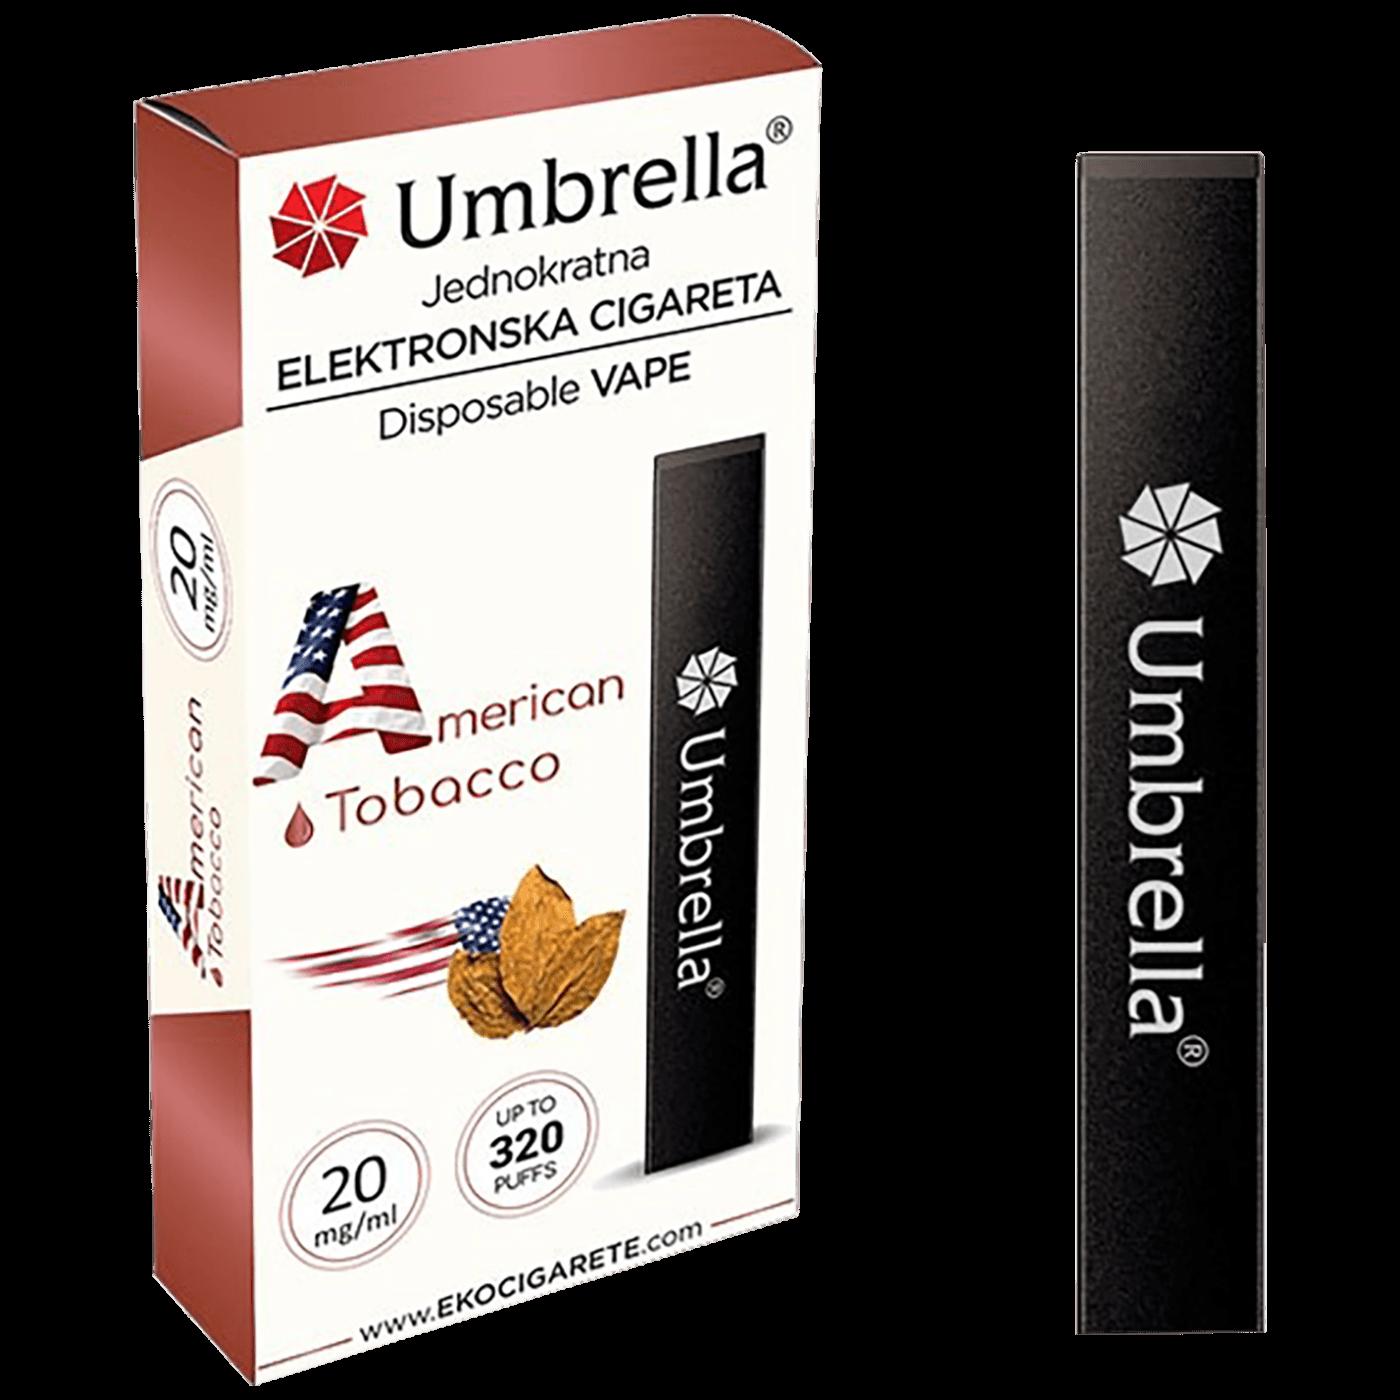 Cigareta elektronska, jednokratna, America Tobacco, 20 mg